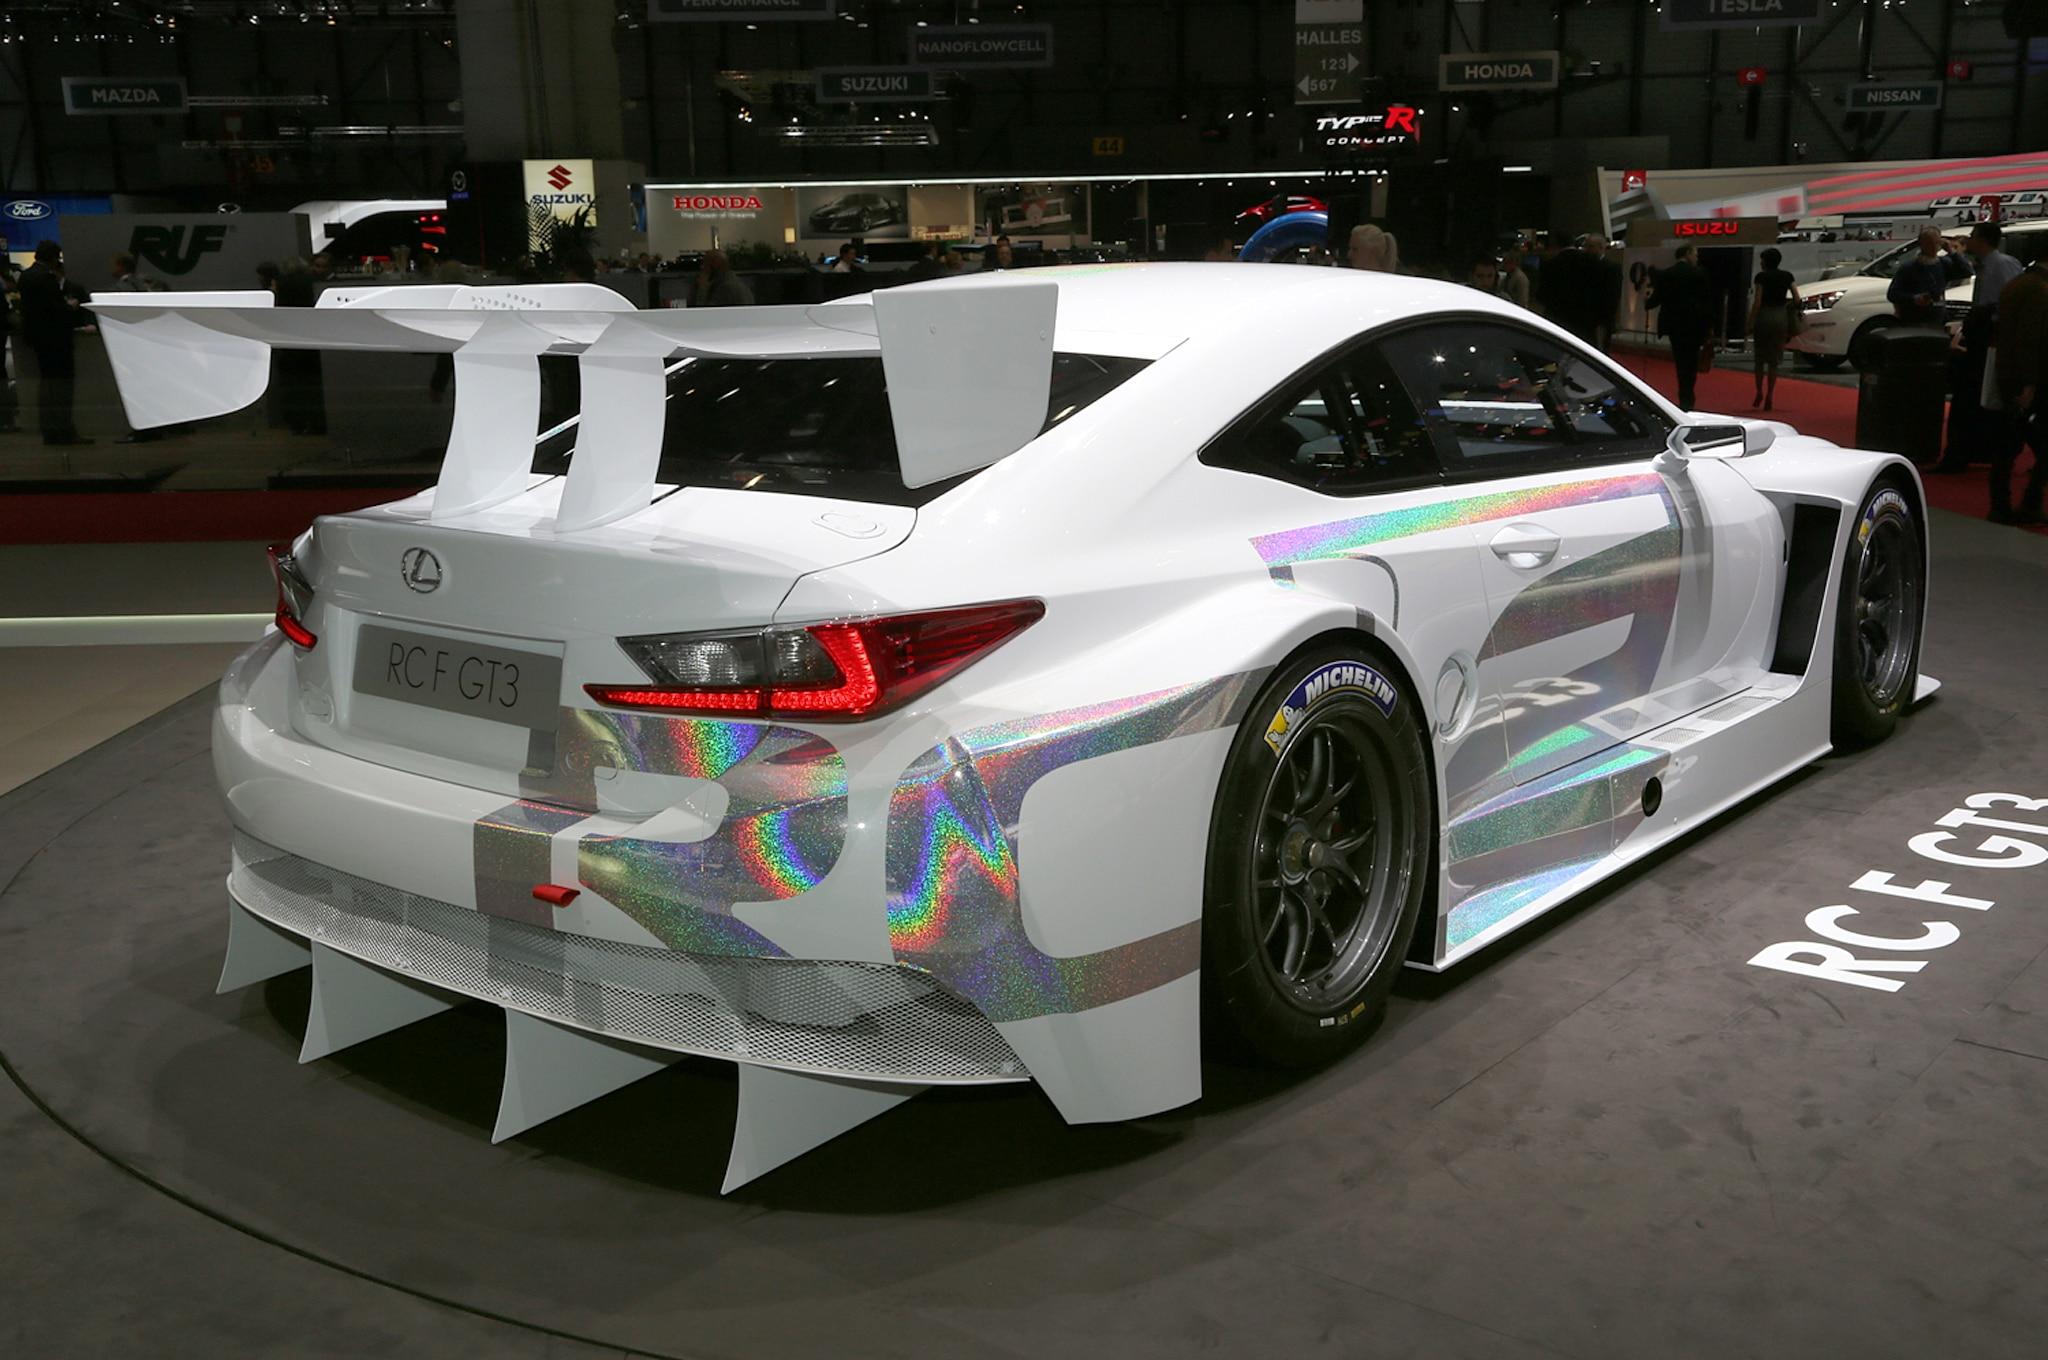 2015 Lexus RC350 F Sport, RC F Race Car Debut In Geneva - Automobile